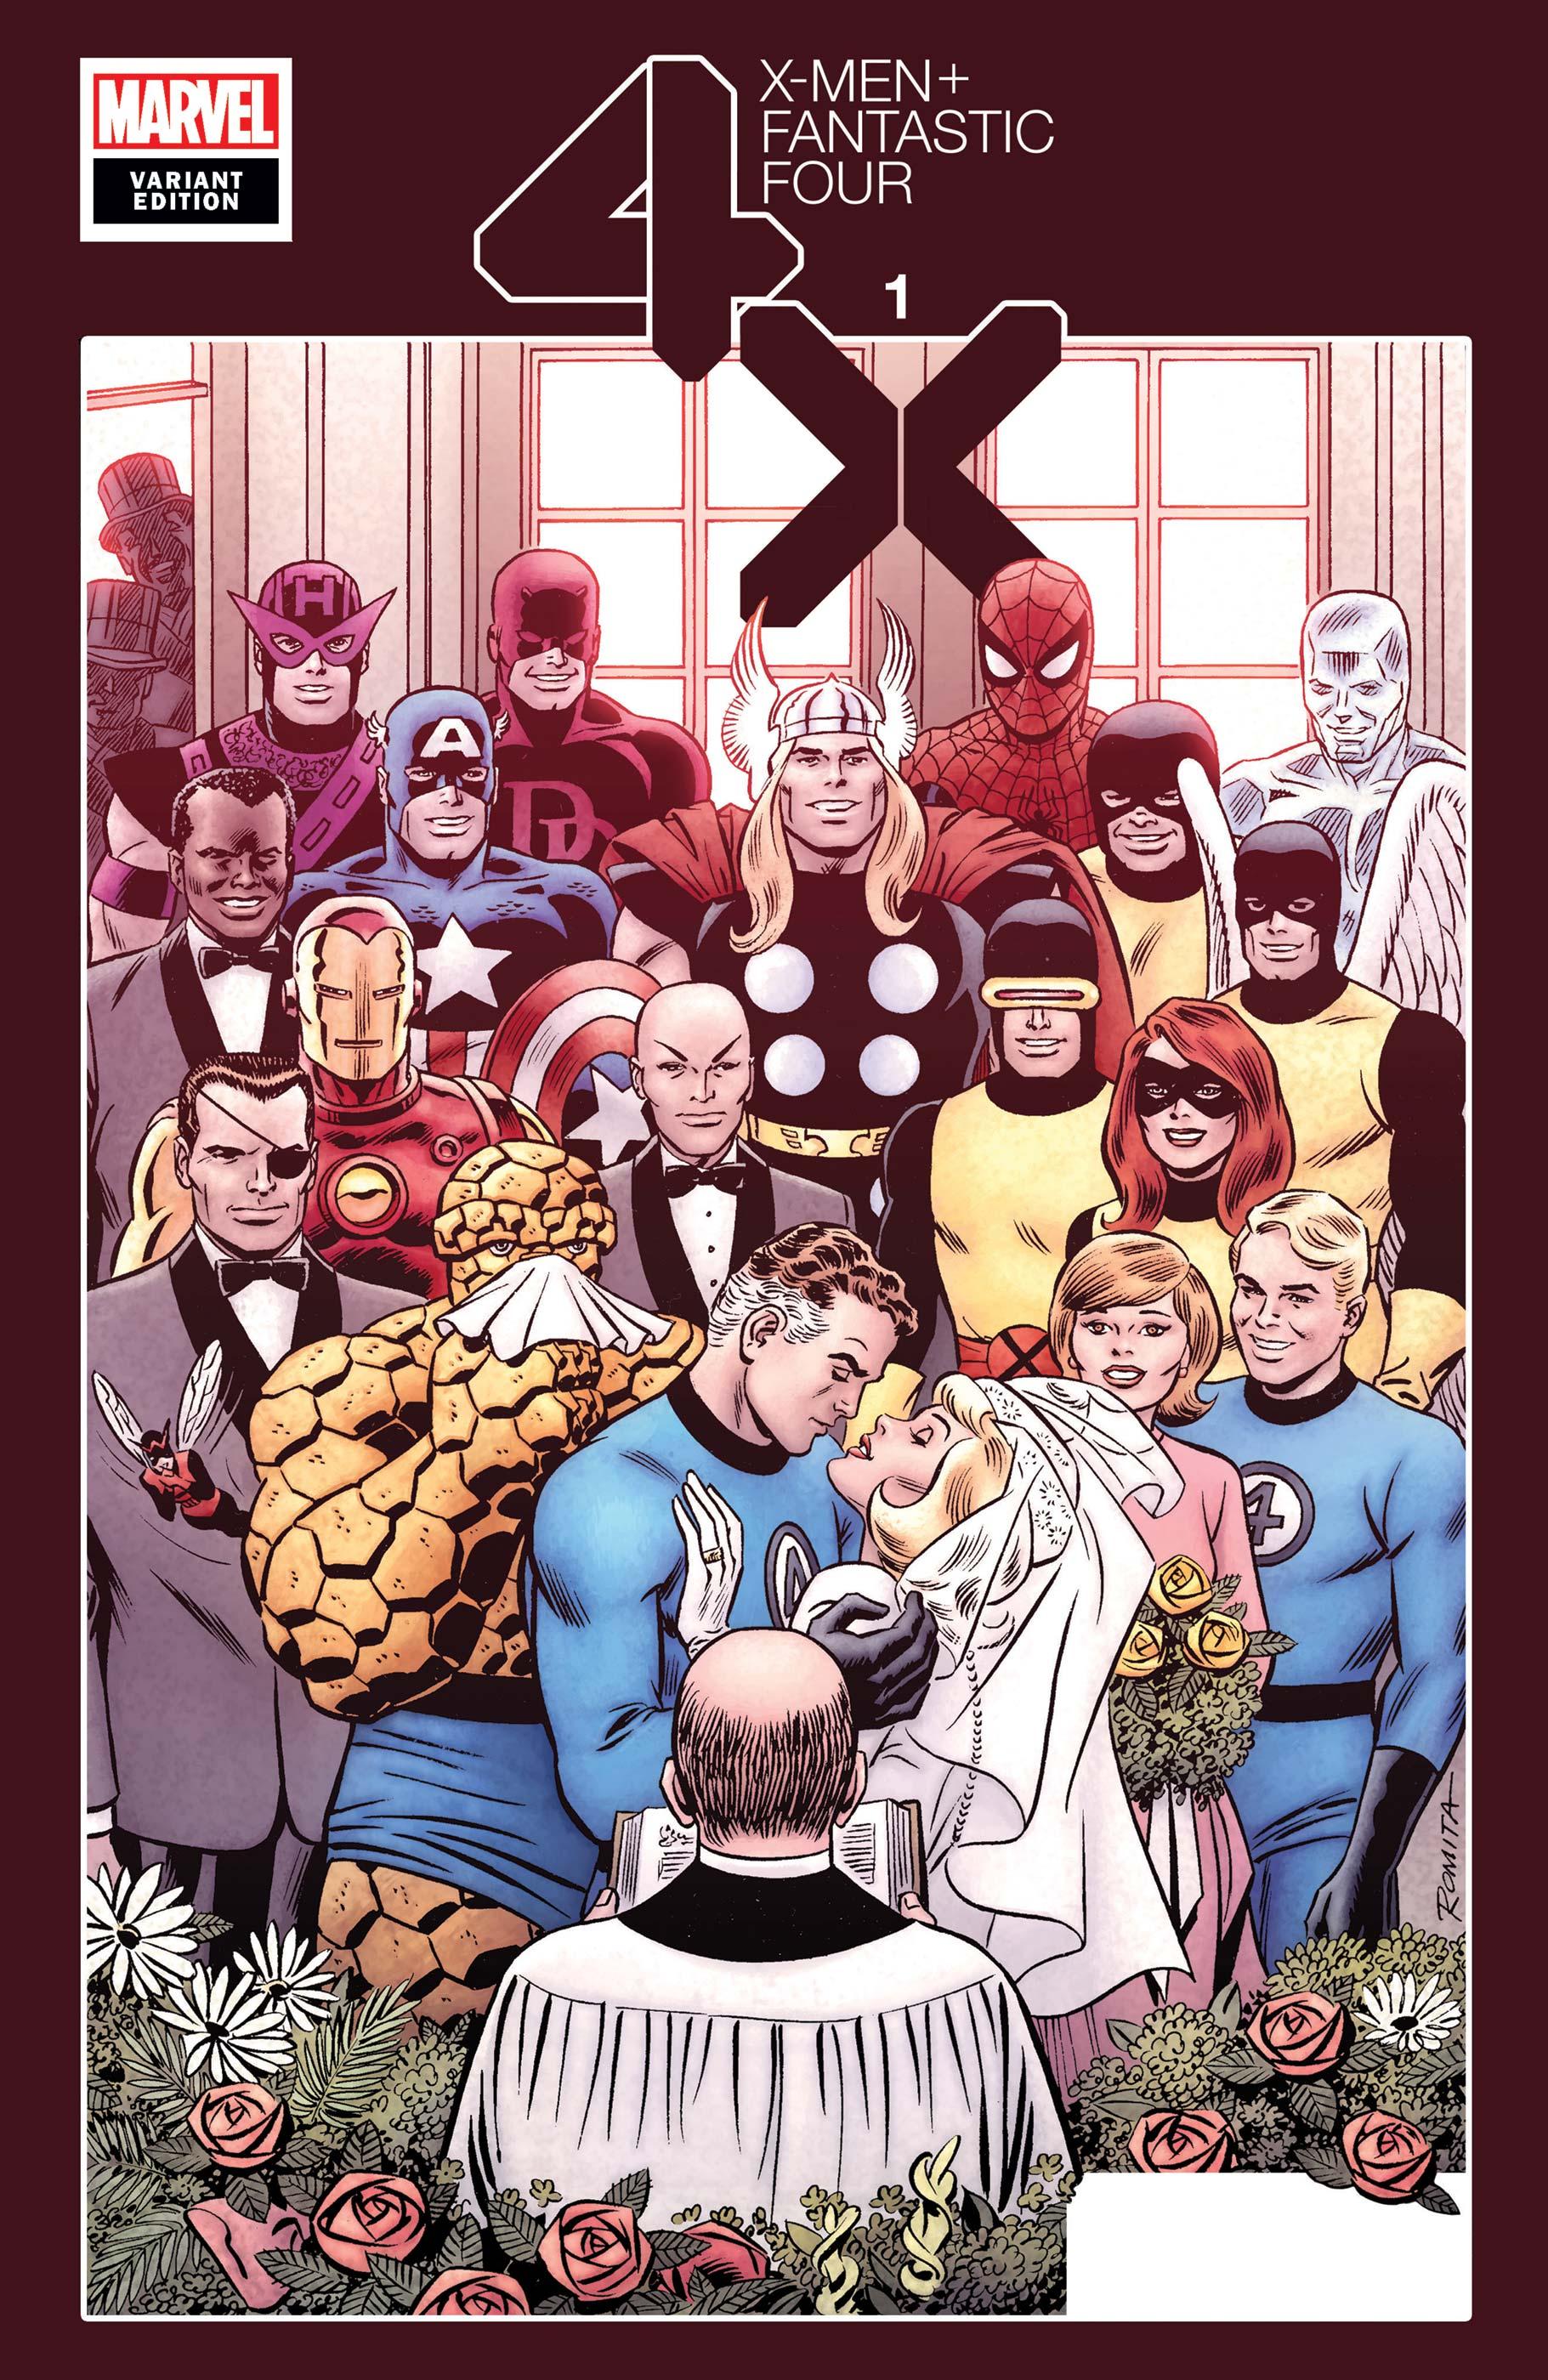 X-Men Fantastic Four Vol 2 1 Hidden Gem Variant.jpg